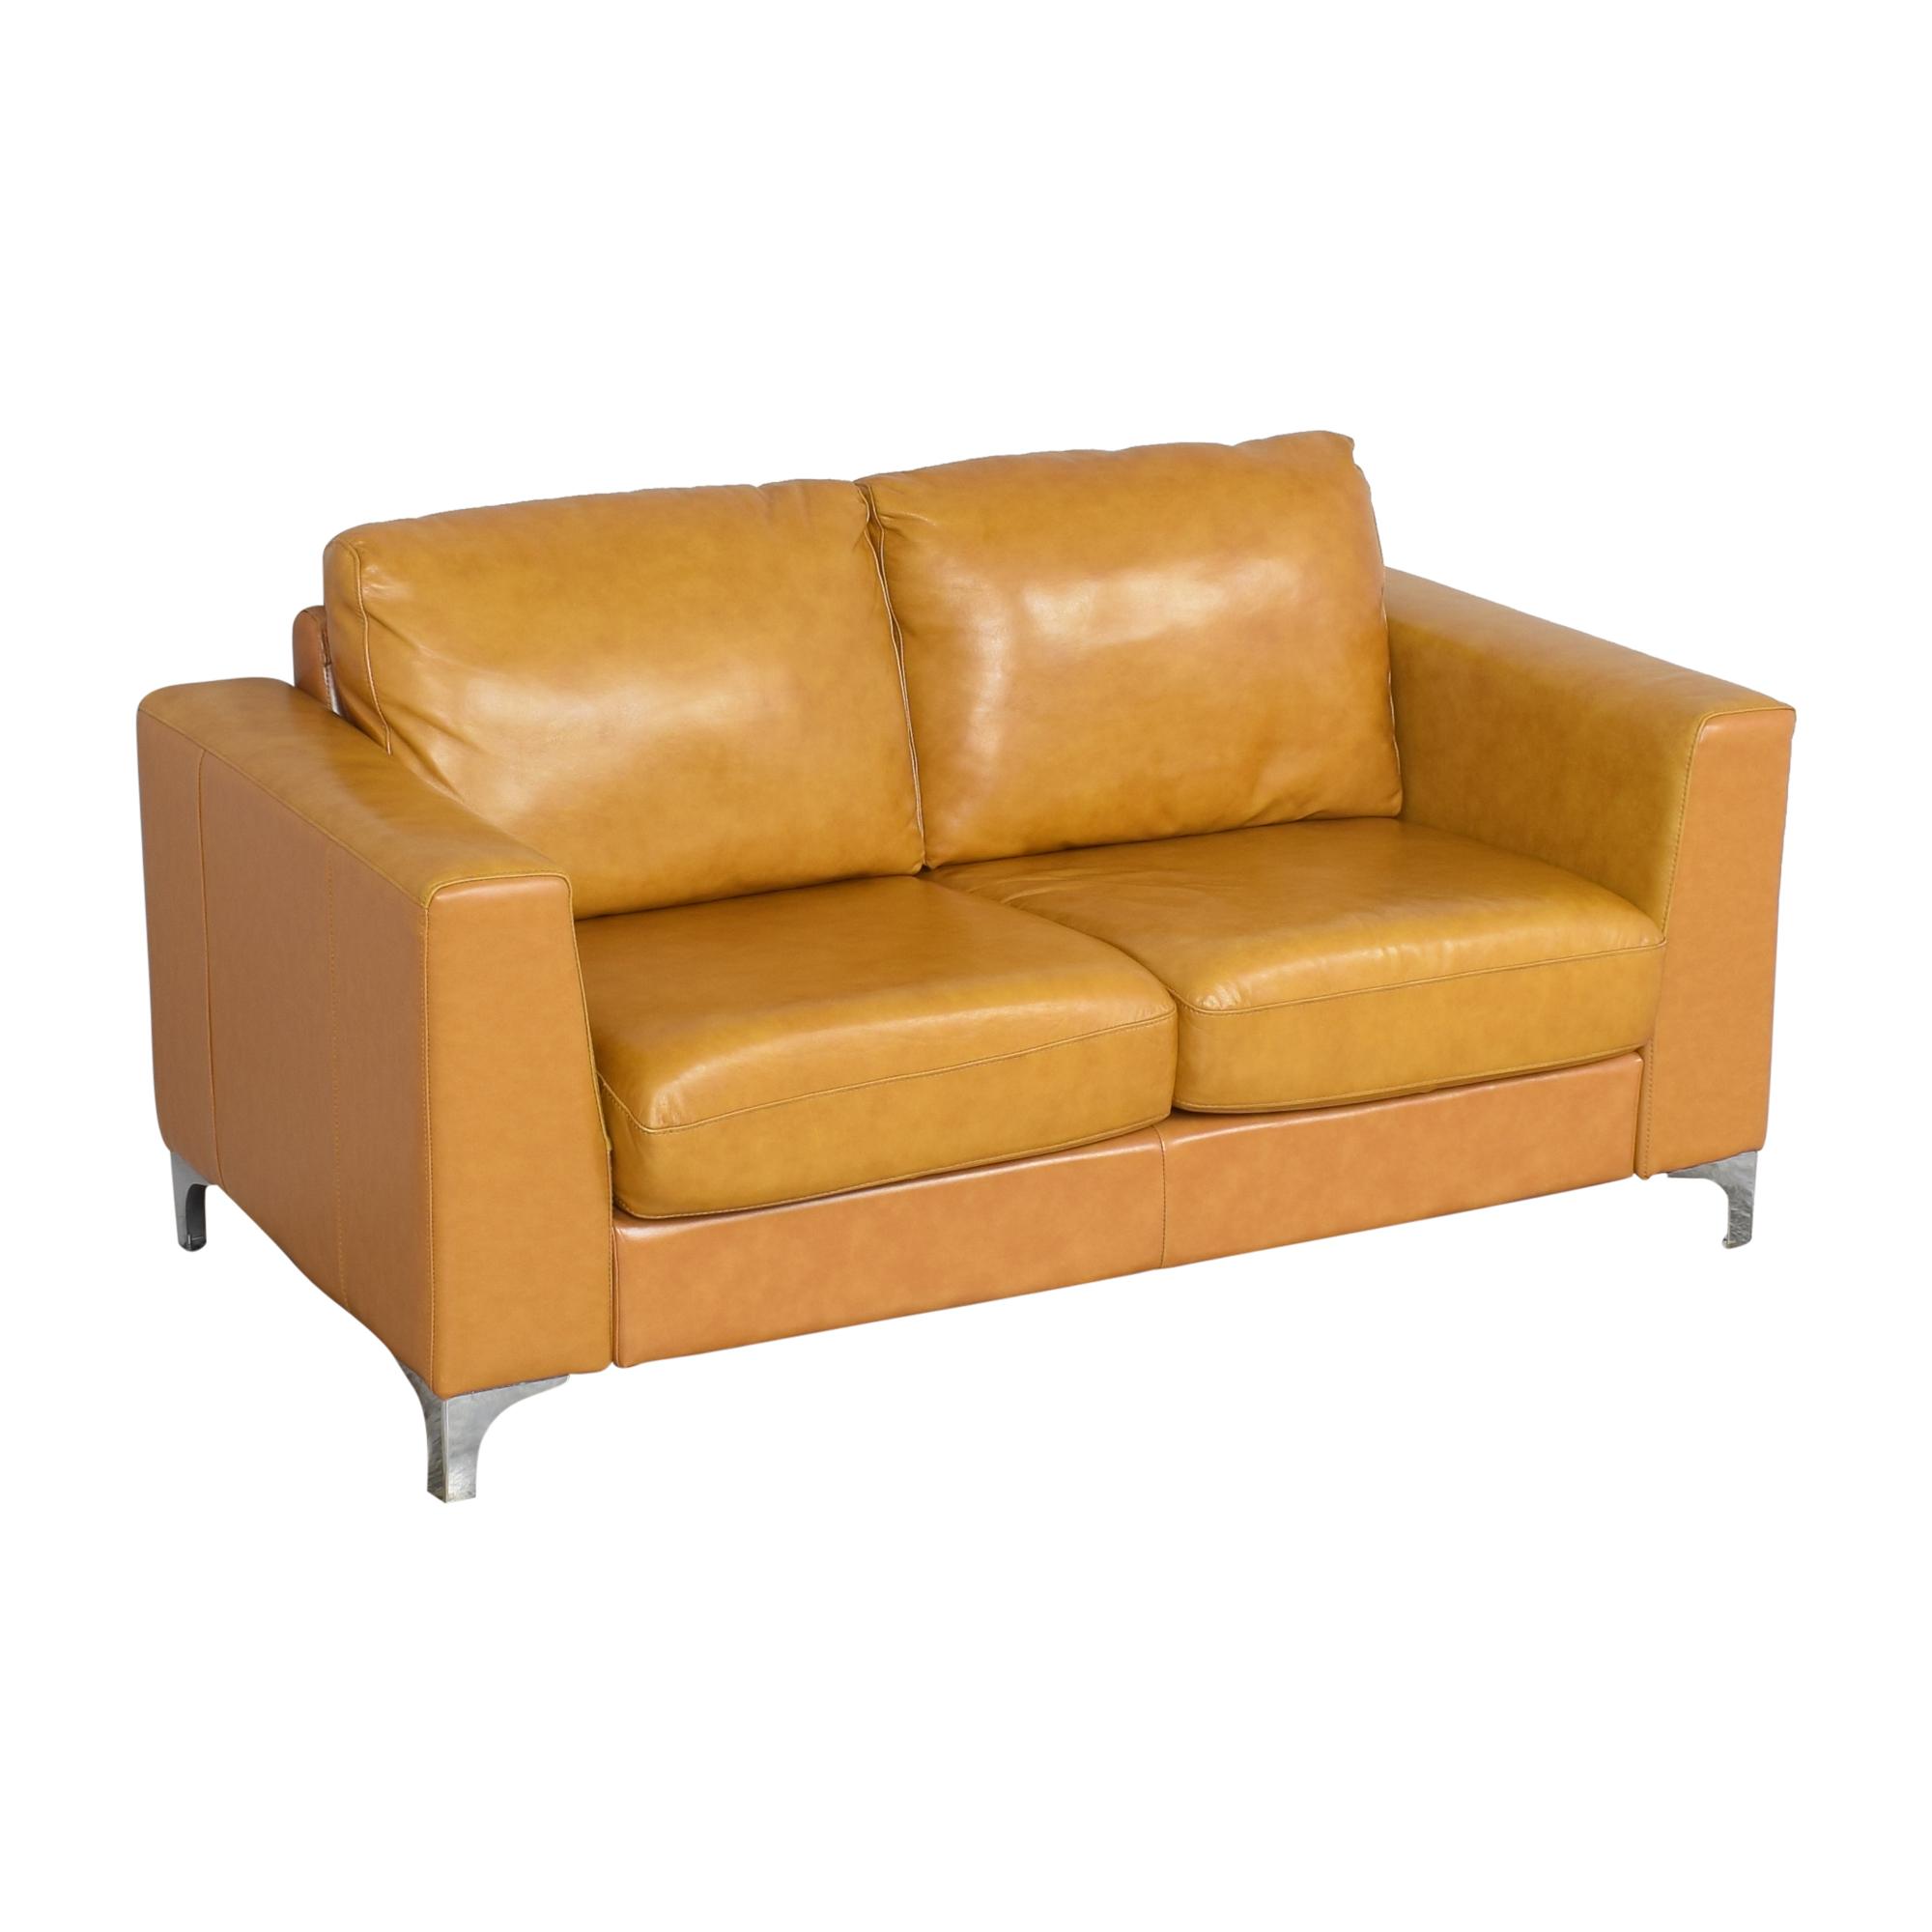 Wayfair Wayfair Modern Two Cushion Sofa second hand